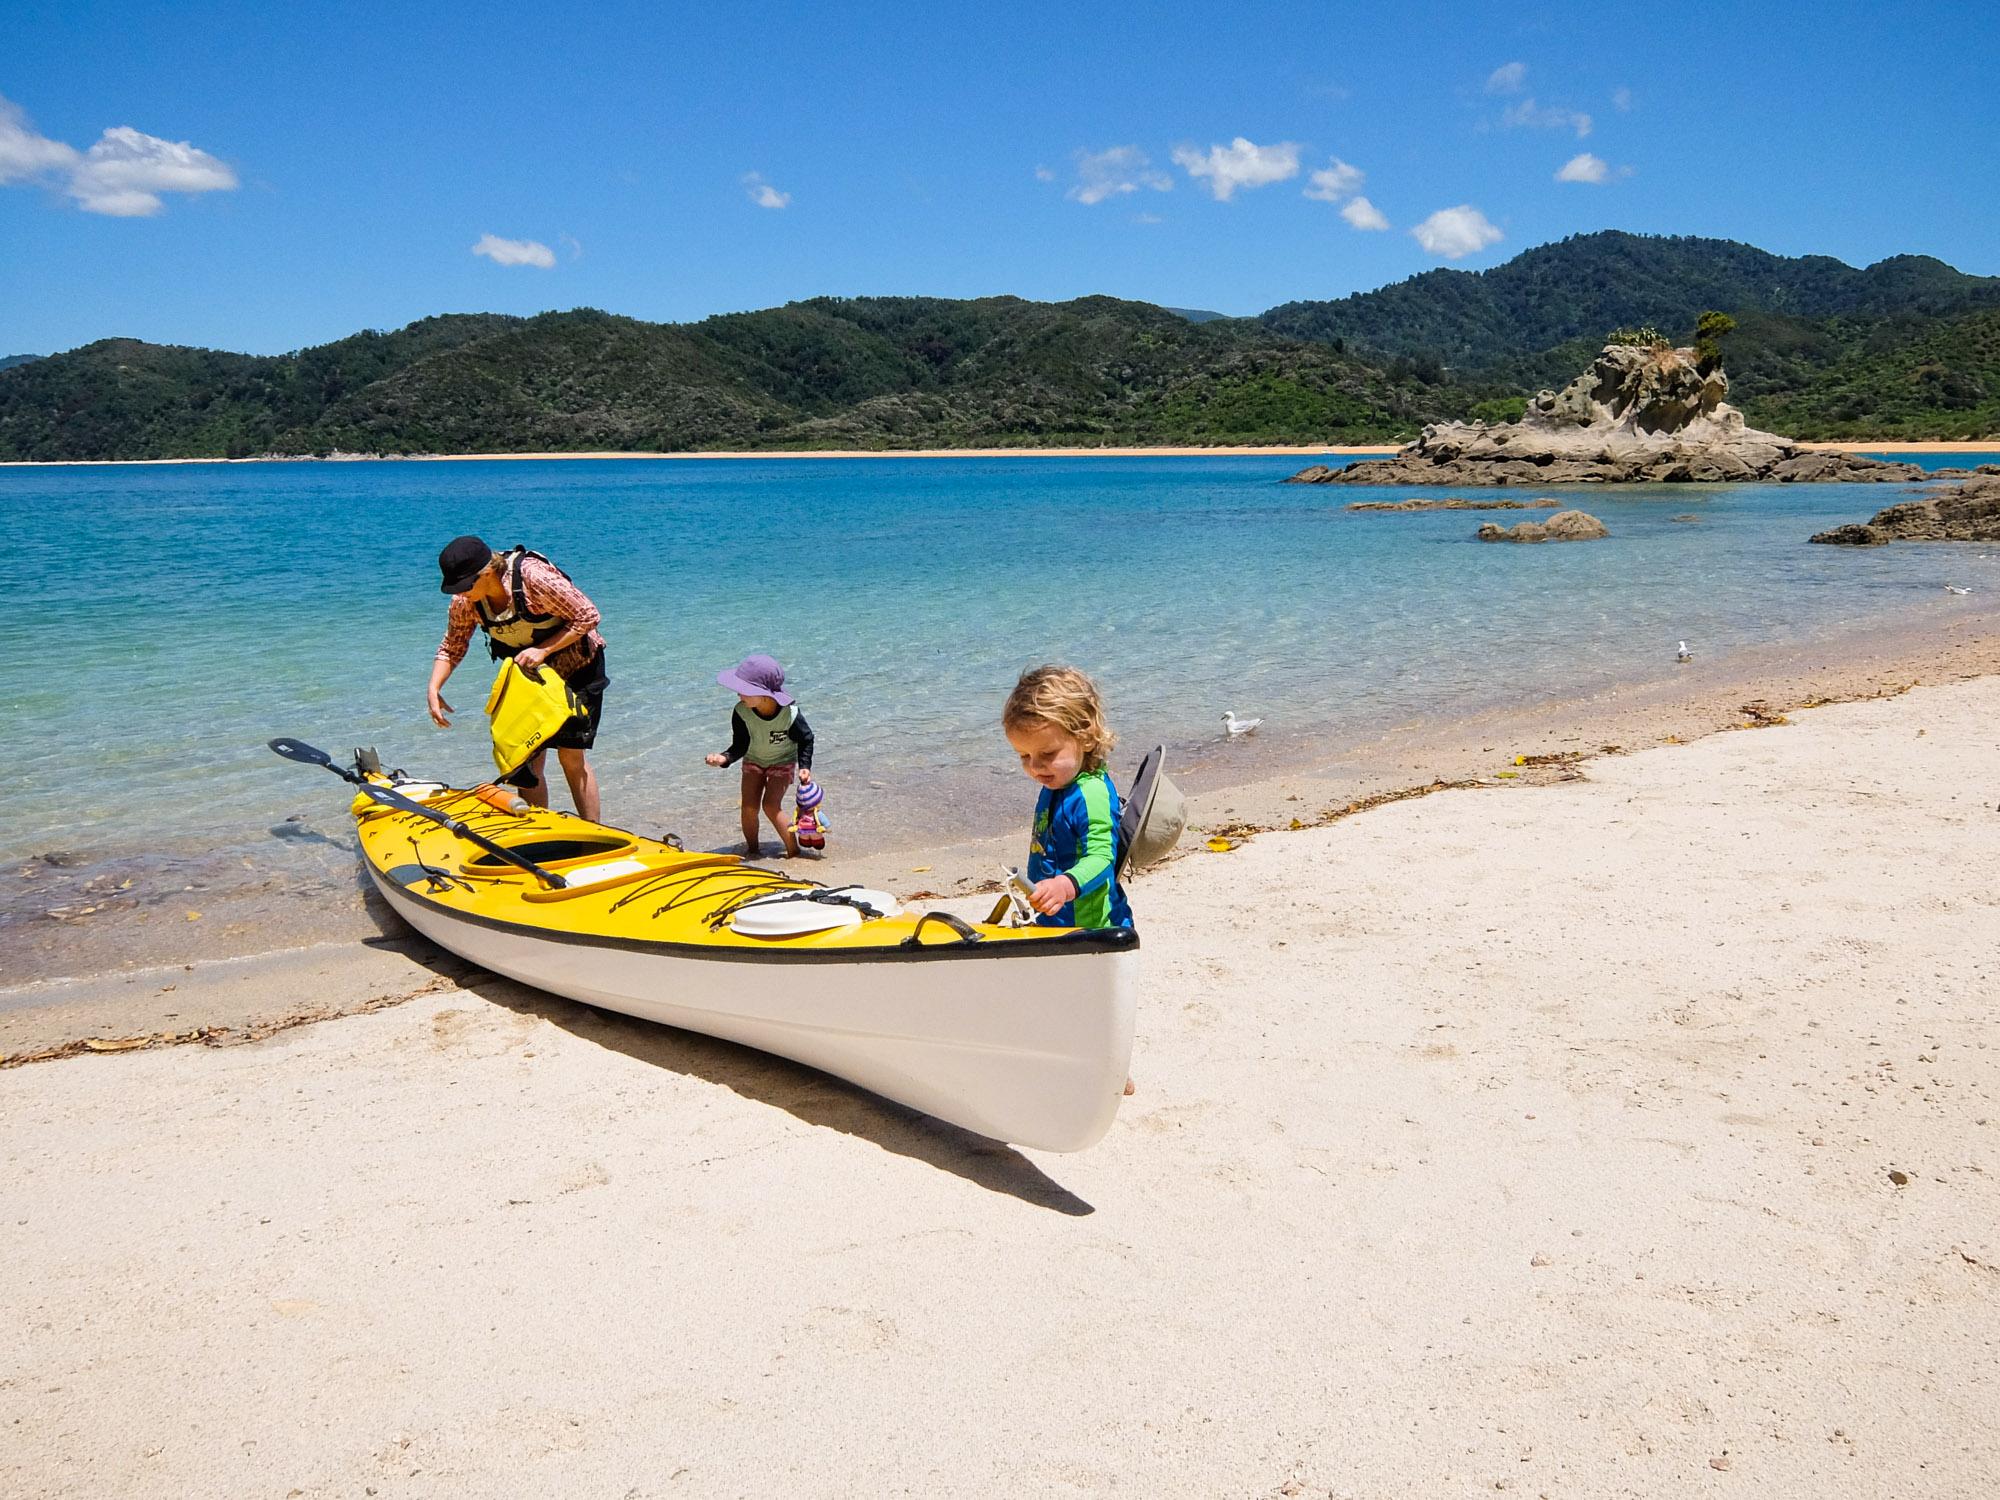 The next generation of sea kayakers. Abel Tasman, New Zealand. © www.thomaspickard.com